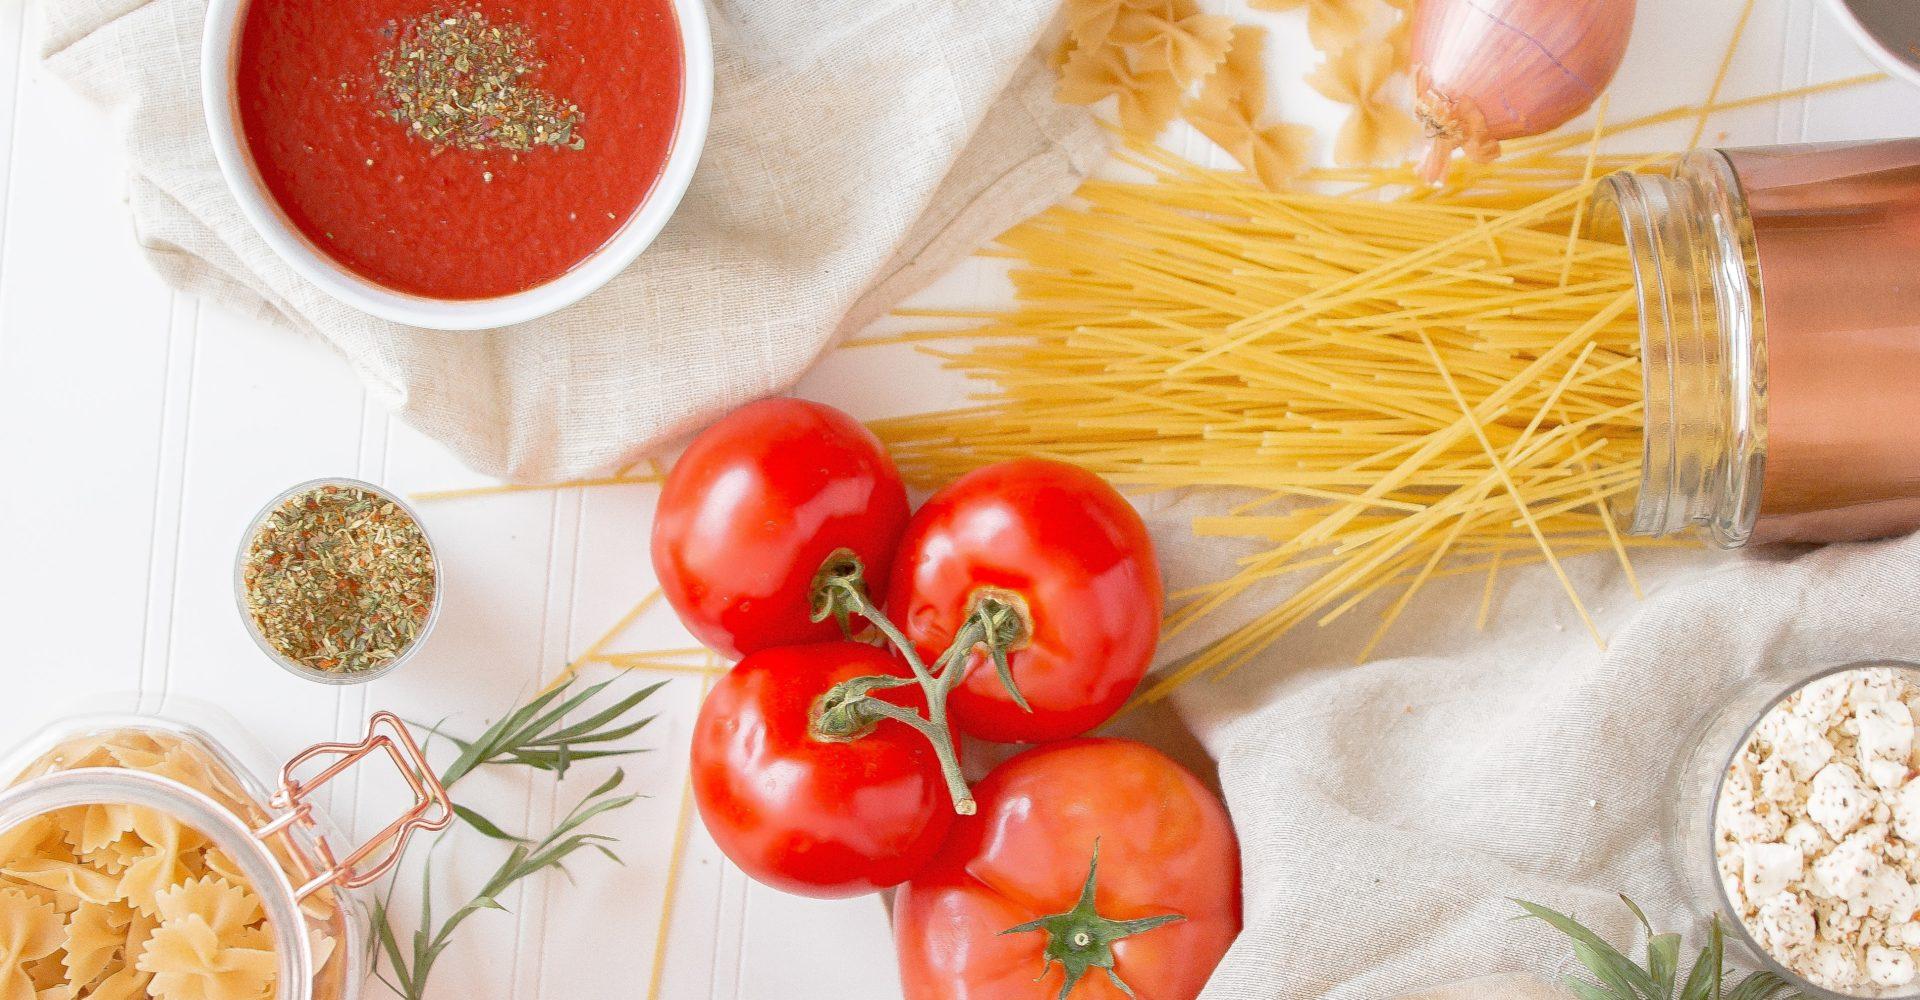 Agropirateria, Cdm da' via libera a ddl su illeciti agroalimentari